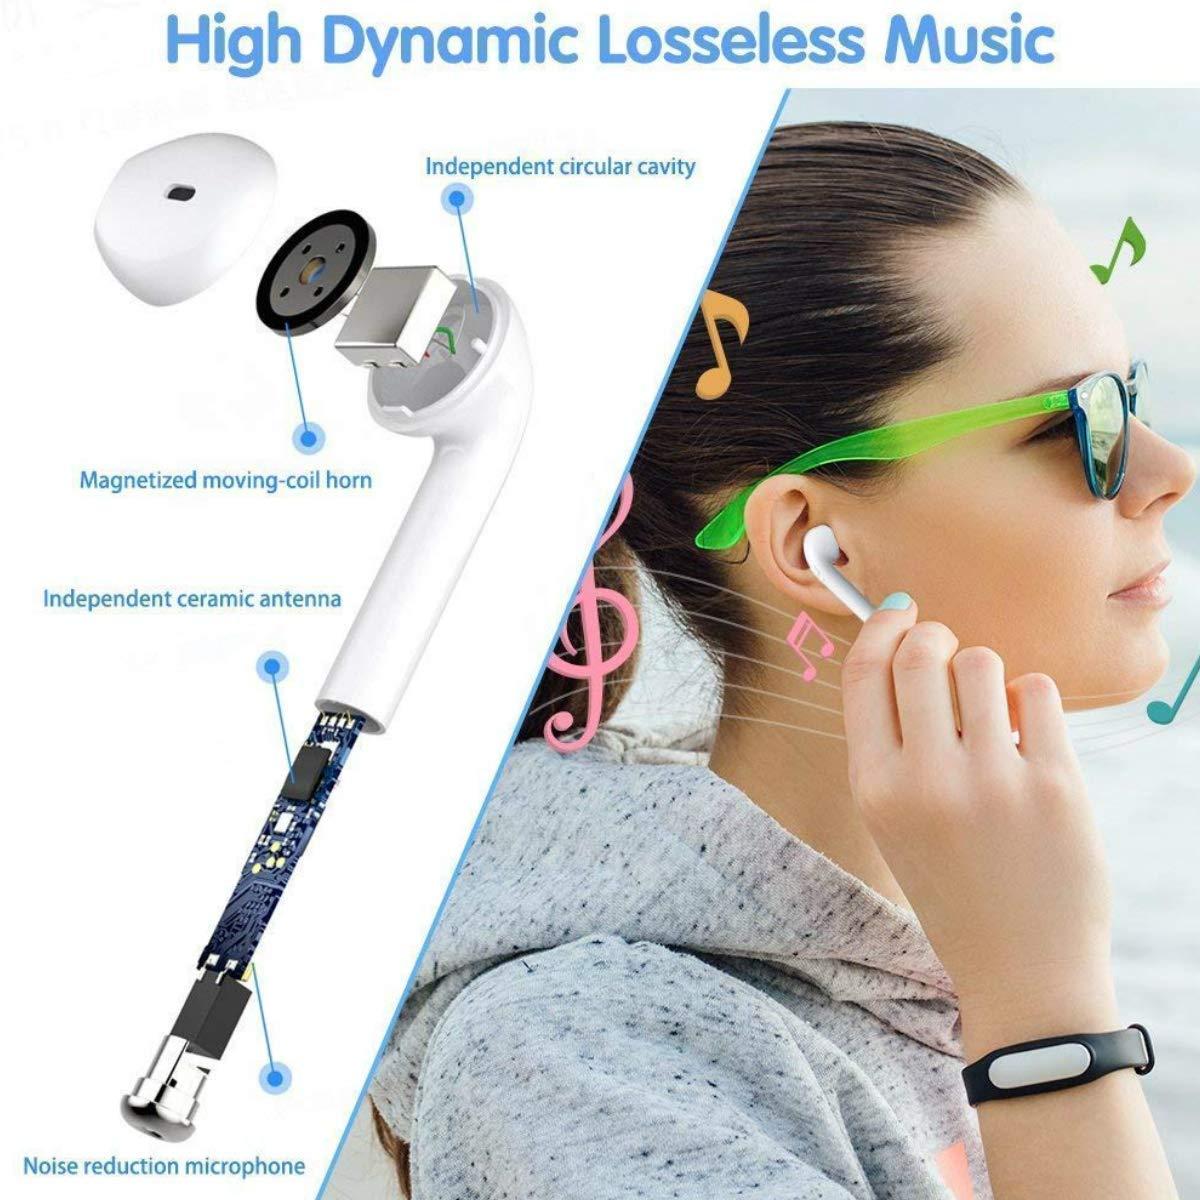 Auriculares bluetooth Auriculares inal/ámbricos Bluetooth 5.0 Sonido Est/éreo Auricular Mini Twins In-Ear Auriculares Carga Rapida Resistente al Agua con Caja de Carga para iPhone y Android